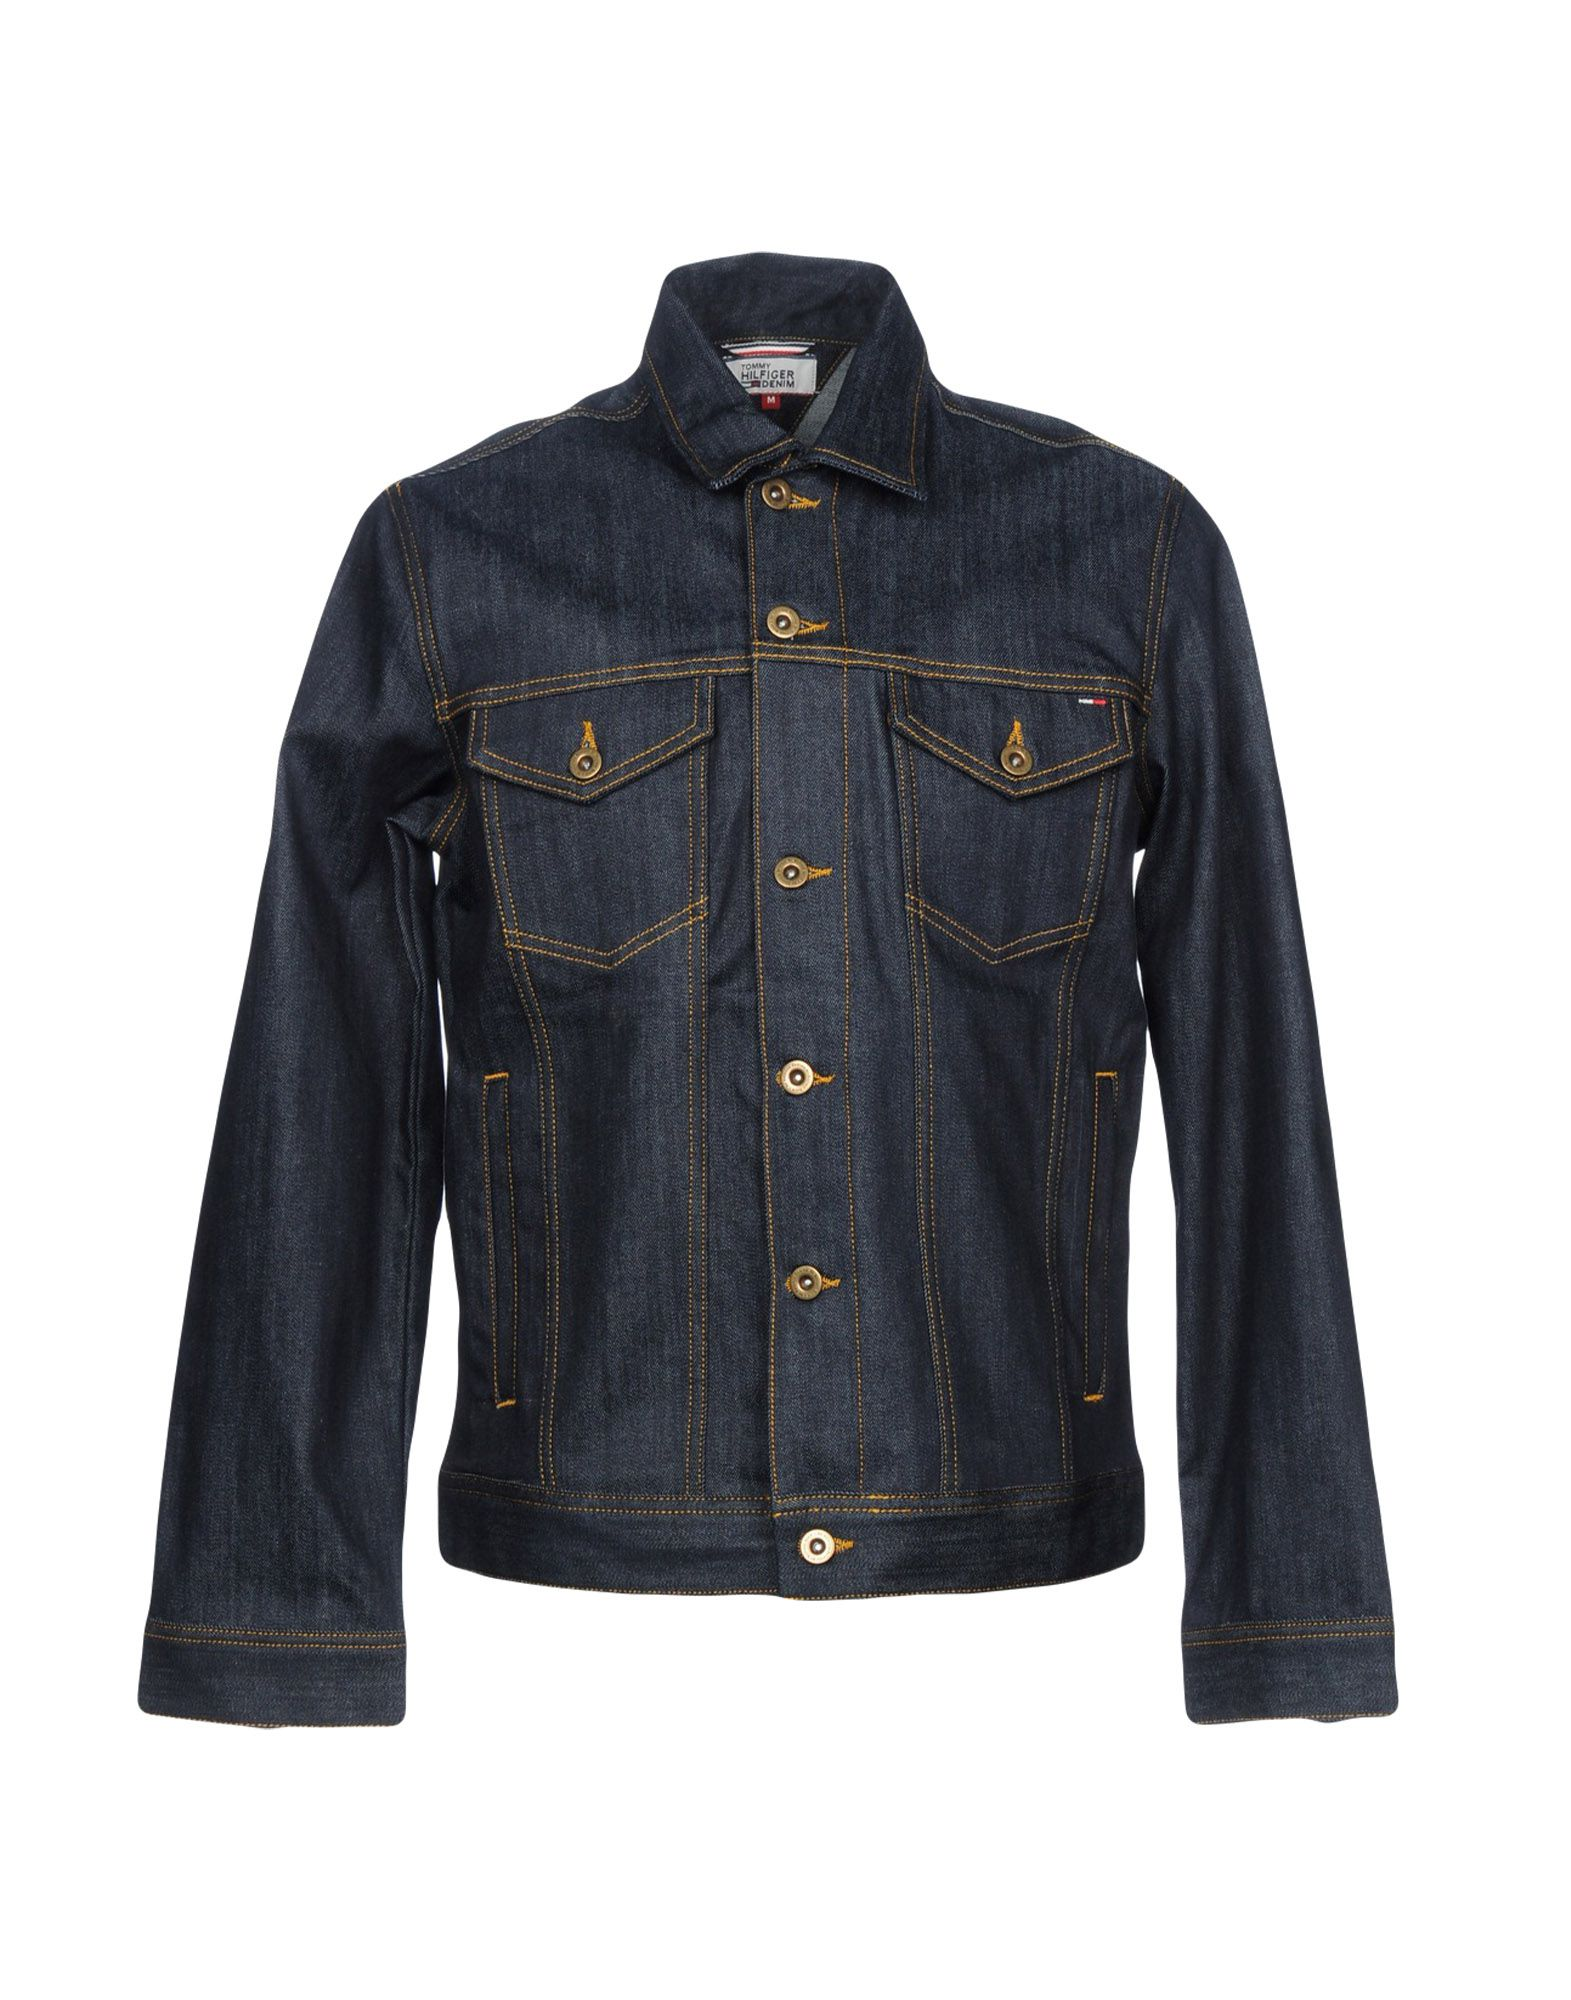 Giubbotto - Jeans Tommy Jeans Uomo - Giubbotto 42669907TA a95218